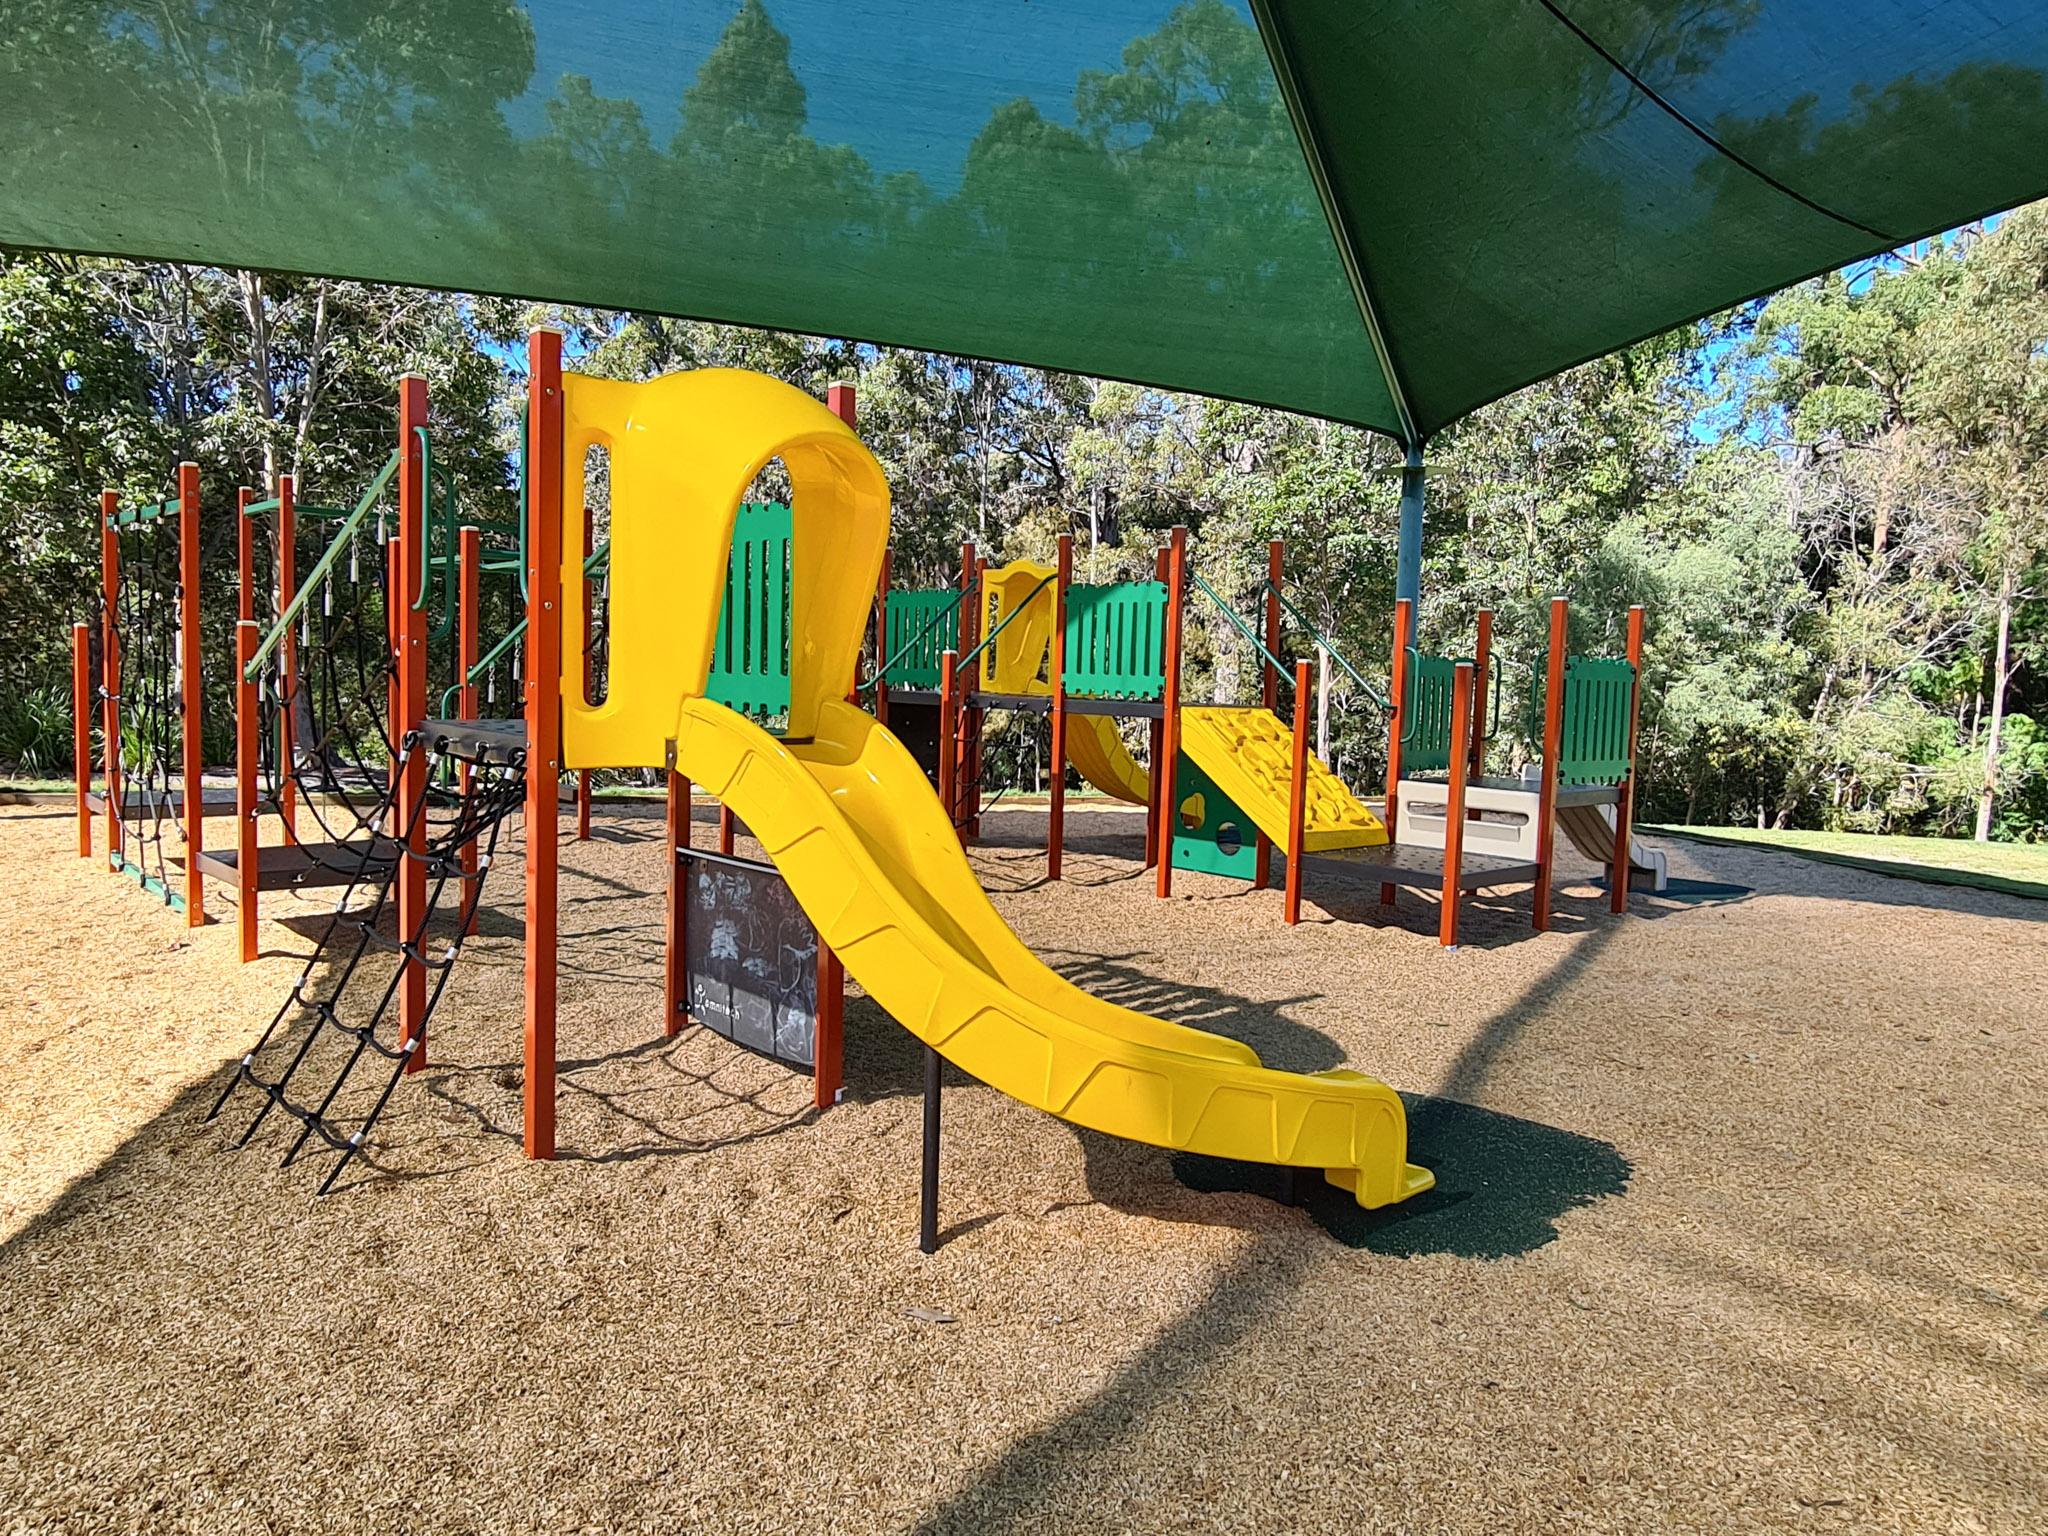 palm-beach-state-school-playrground-austek-play-53